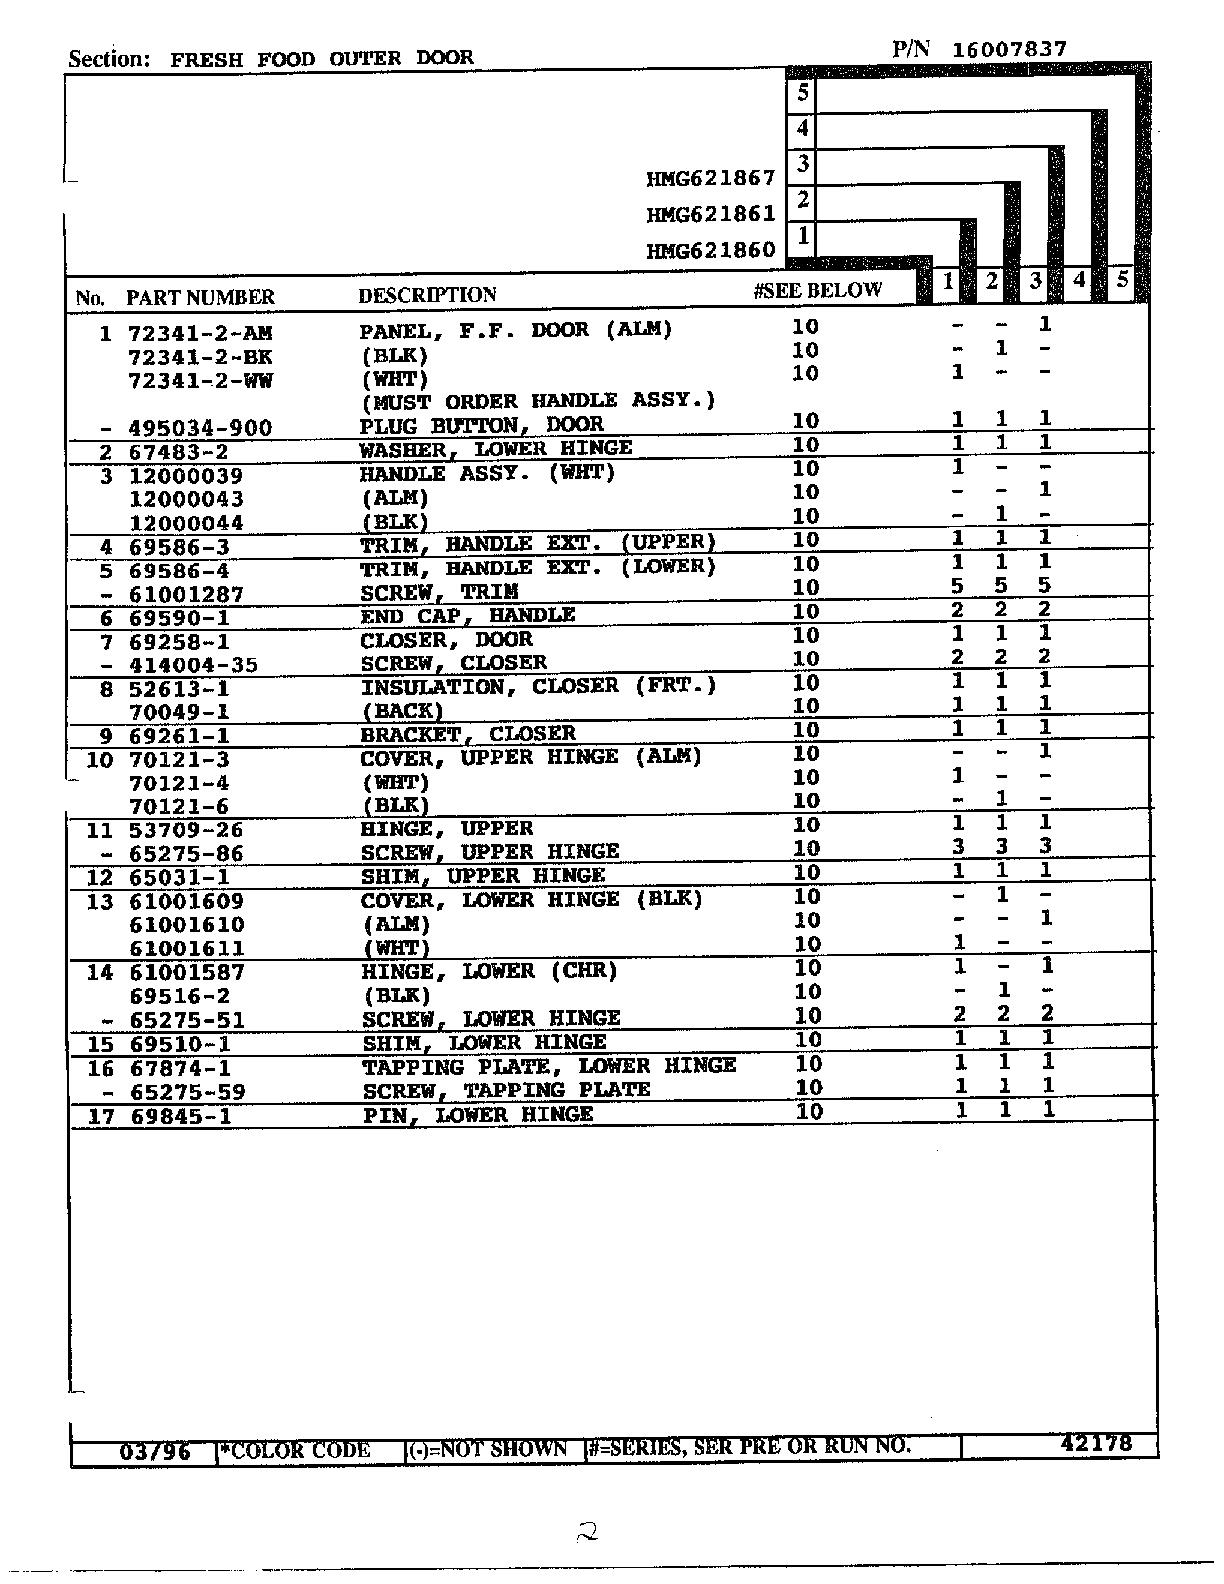 Admiral model HMG621860 side-by-side refrigerator genuine